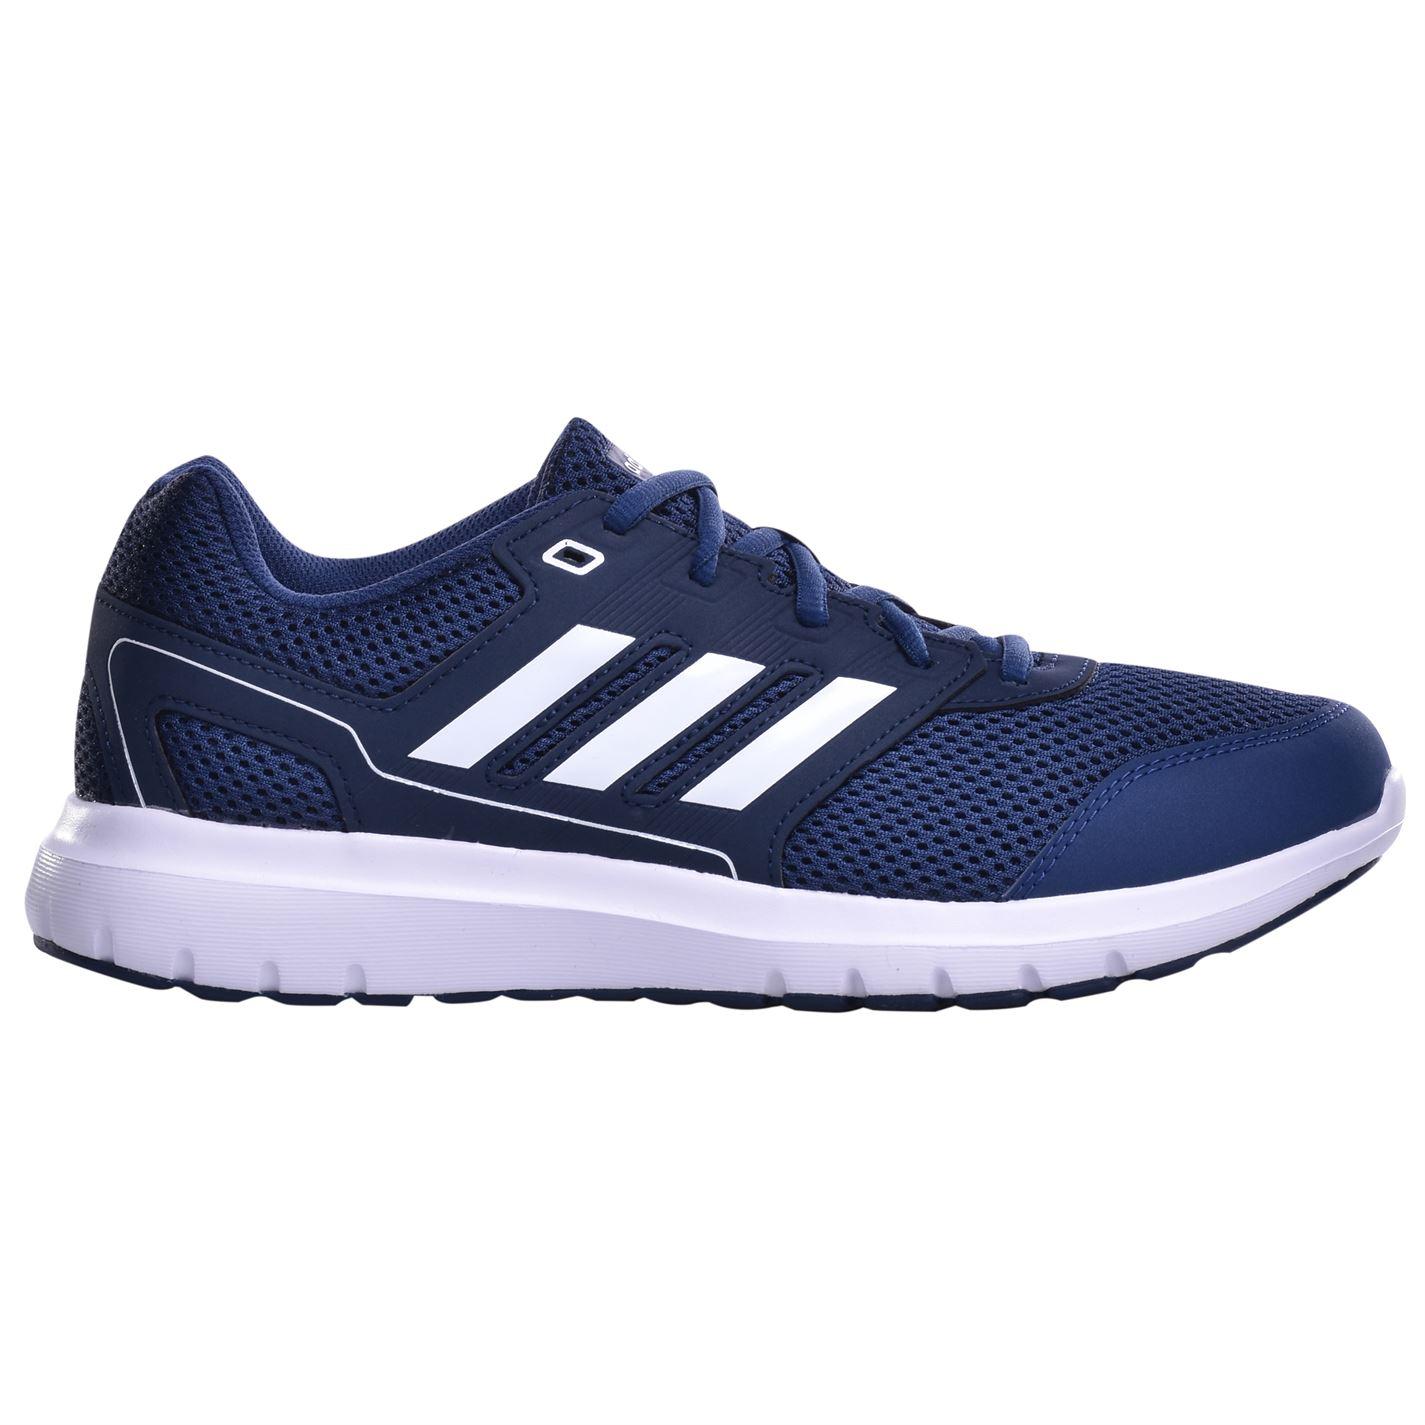 Adidas Duramo Lite 2 Mens Trainers